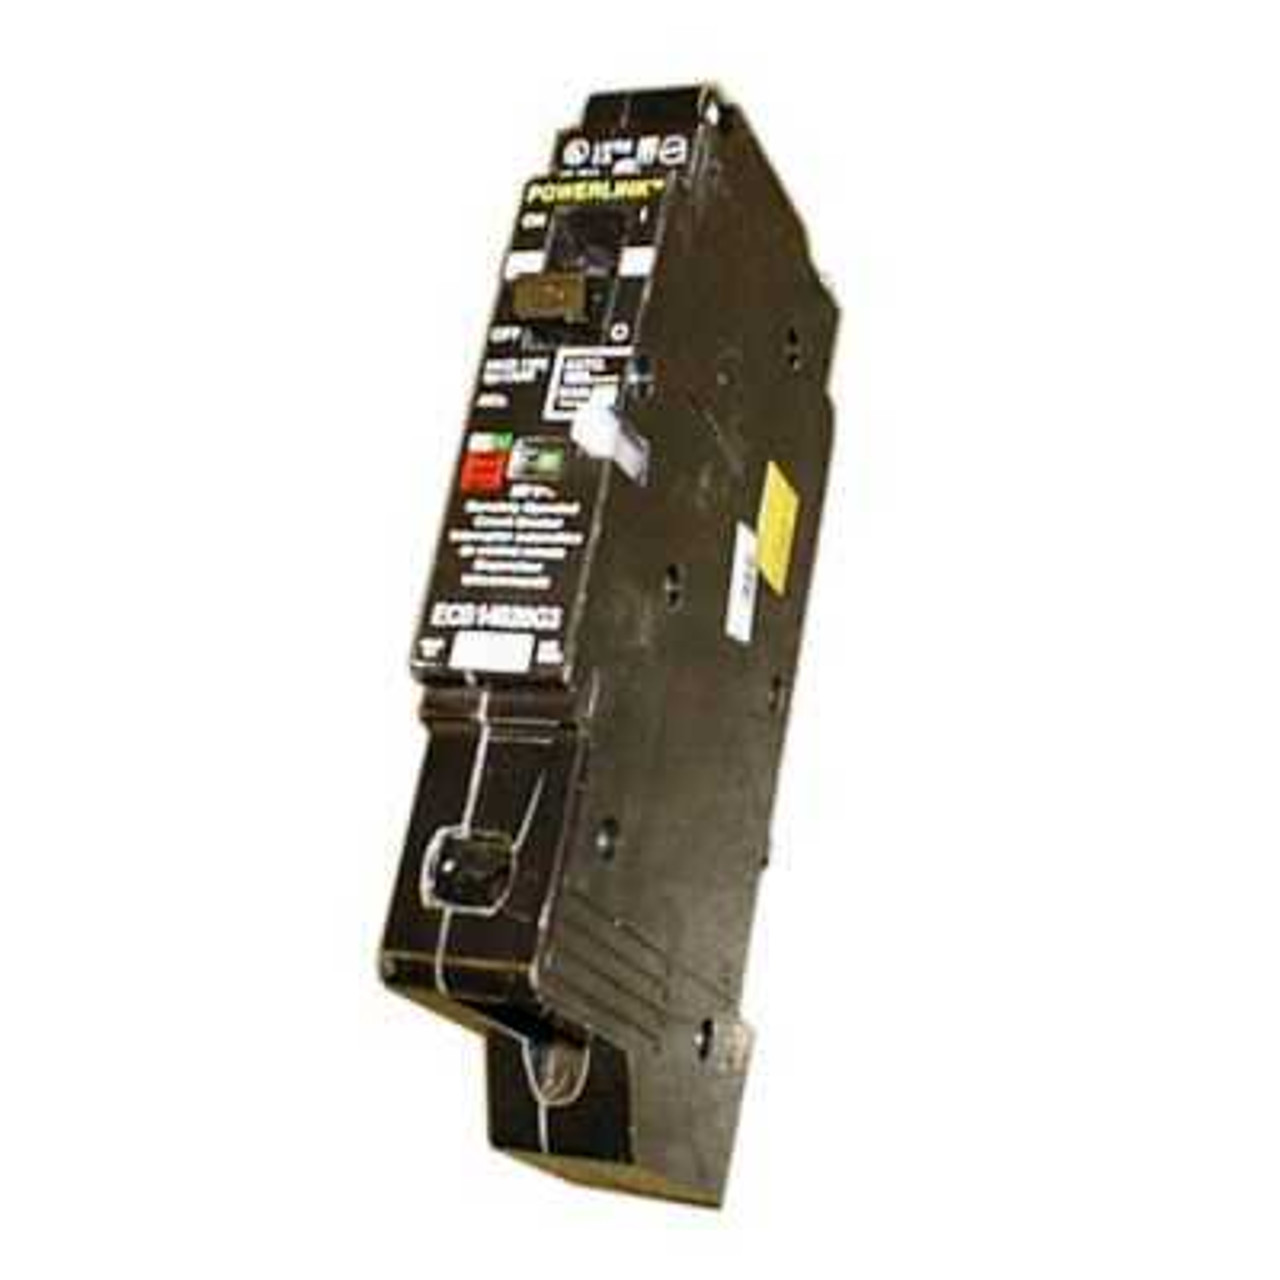 USED Square D ECB14020G3 Powerlink Circuit Breaker 20 Amps 277VAC